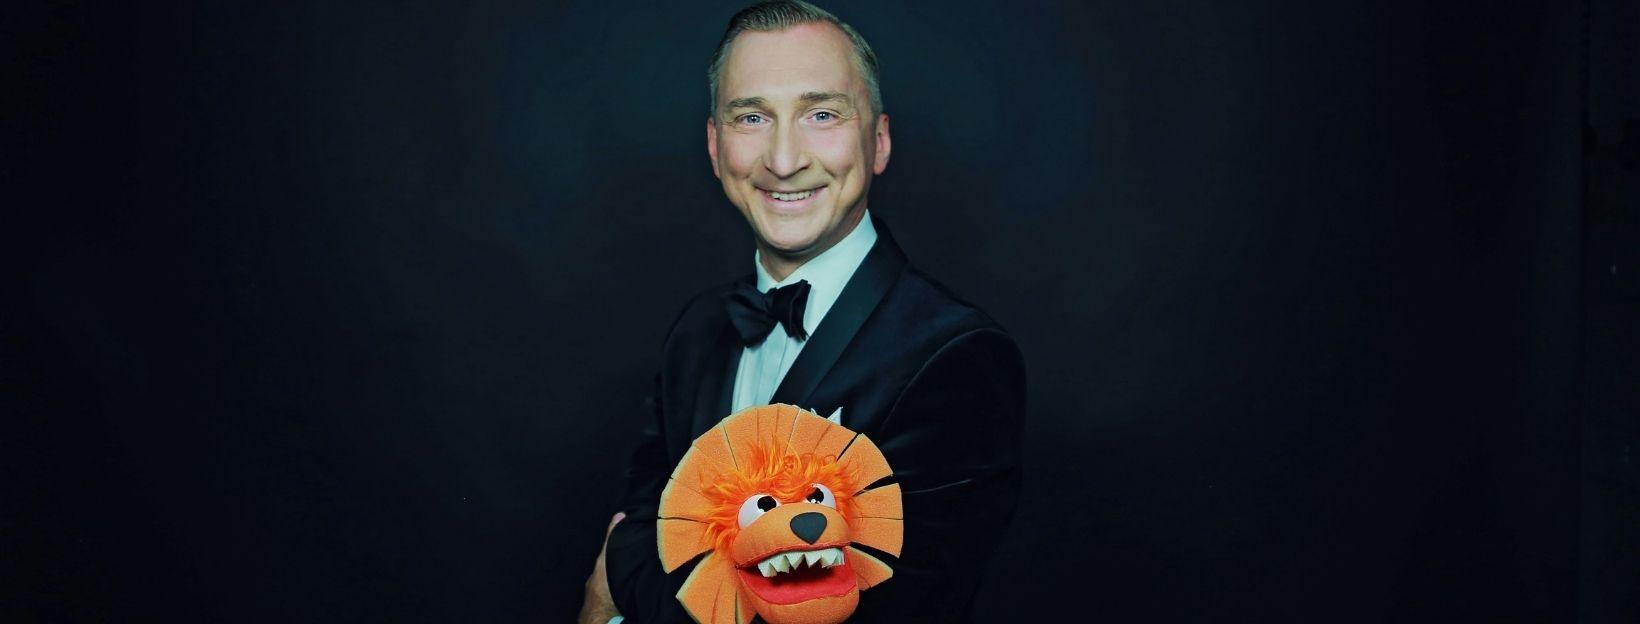 Sebastian Coors mit Löwe